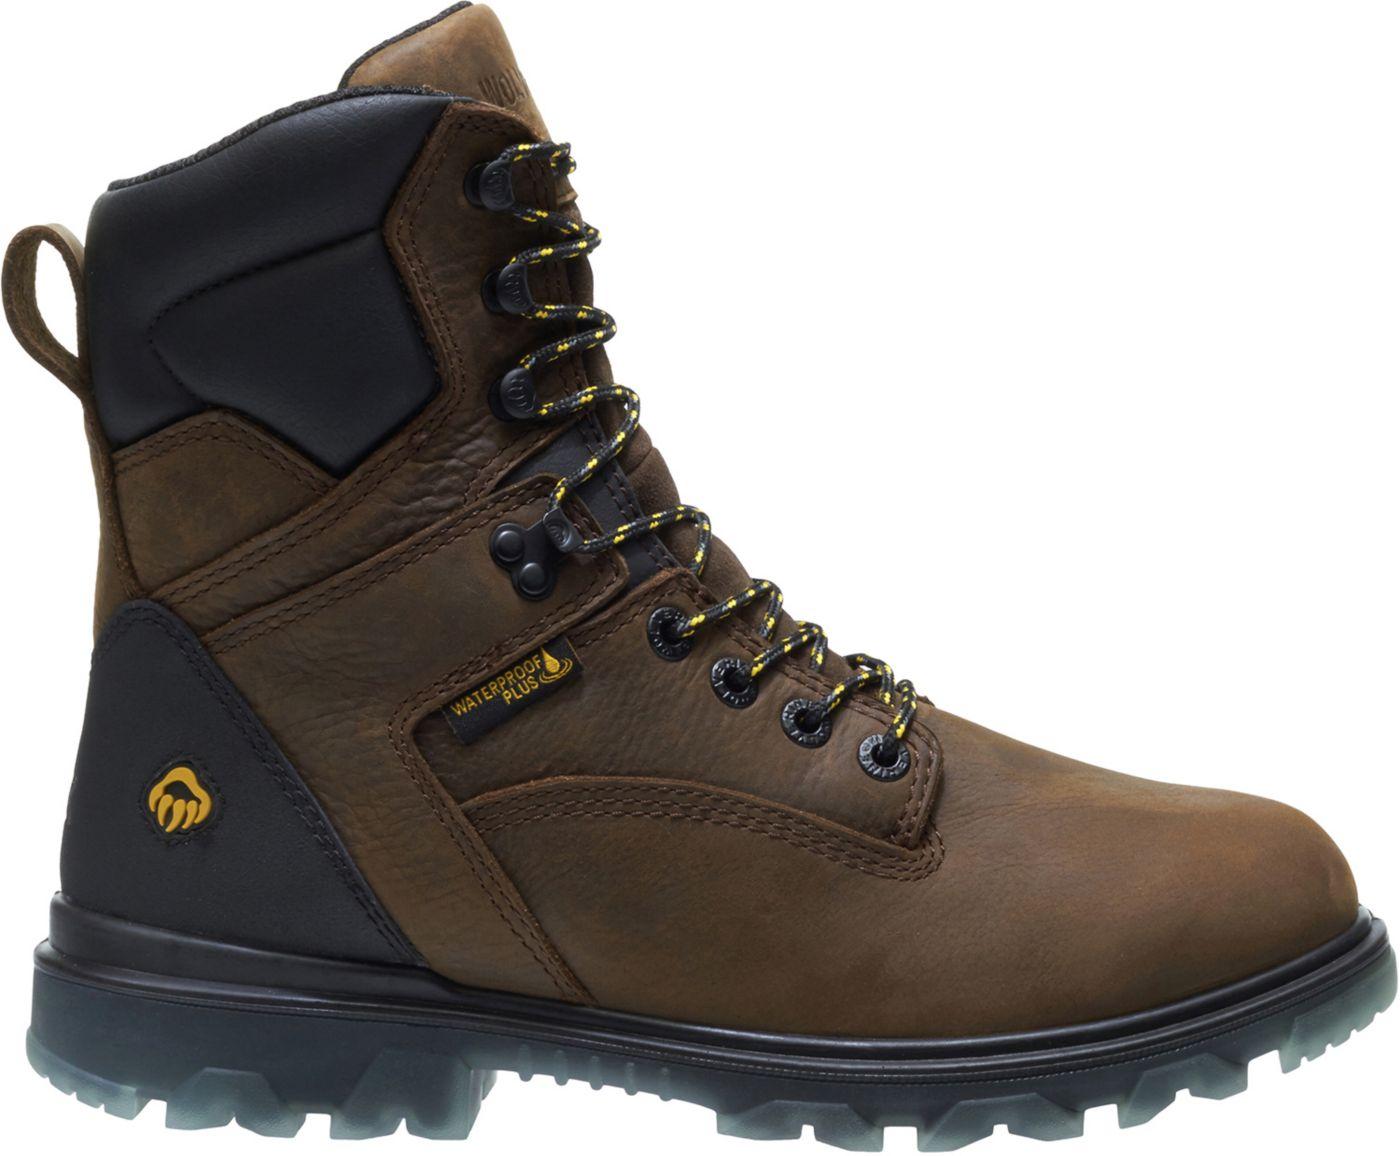 Wolverine Men's I-90 EPX 8'' 400g Waterproof Work Boots